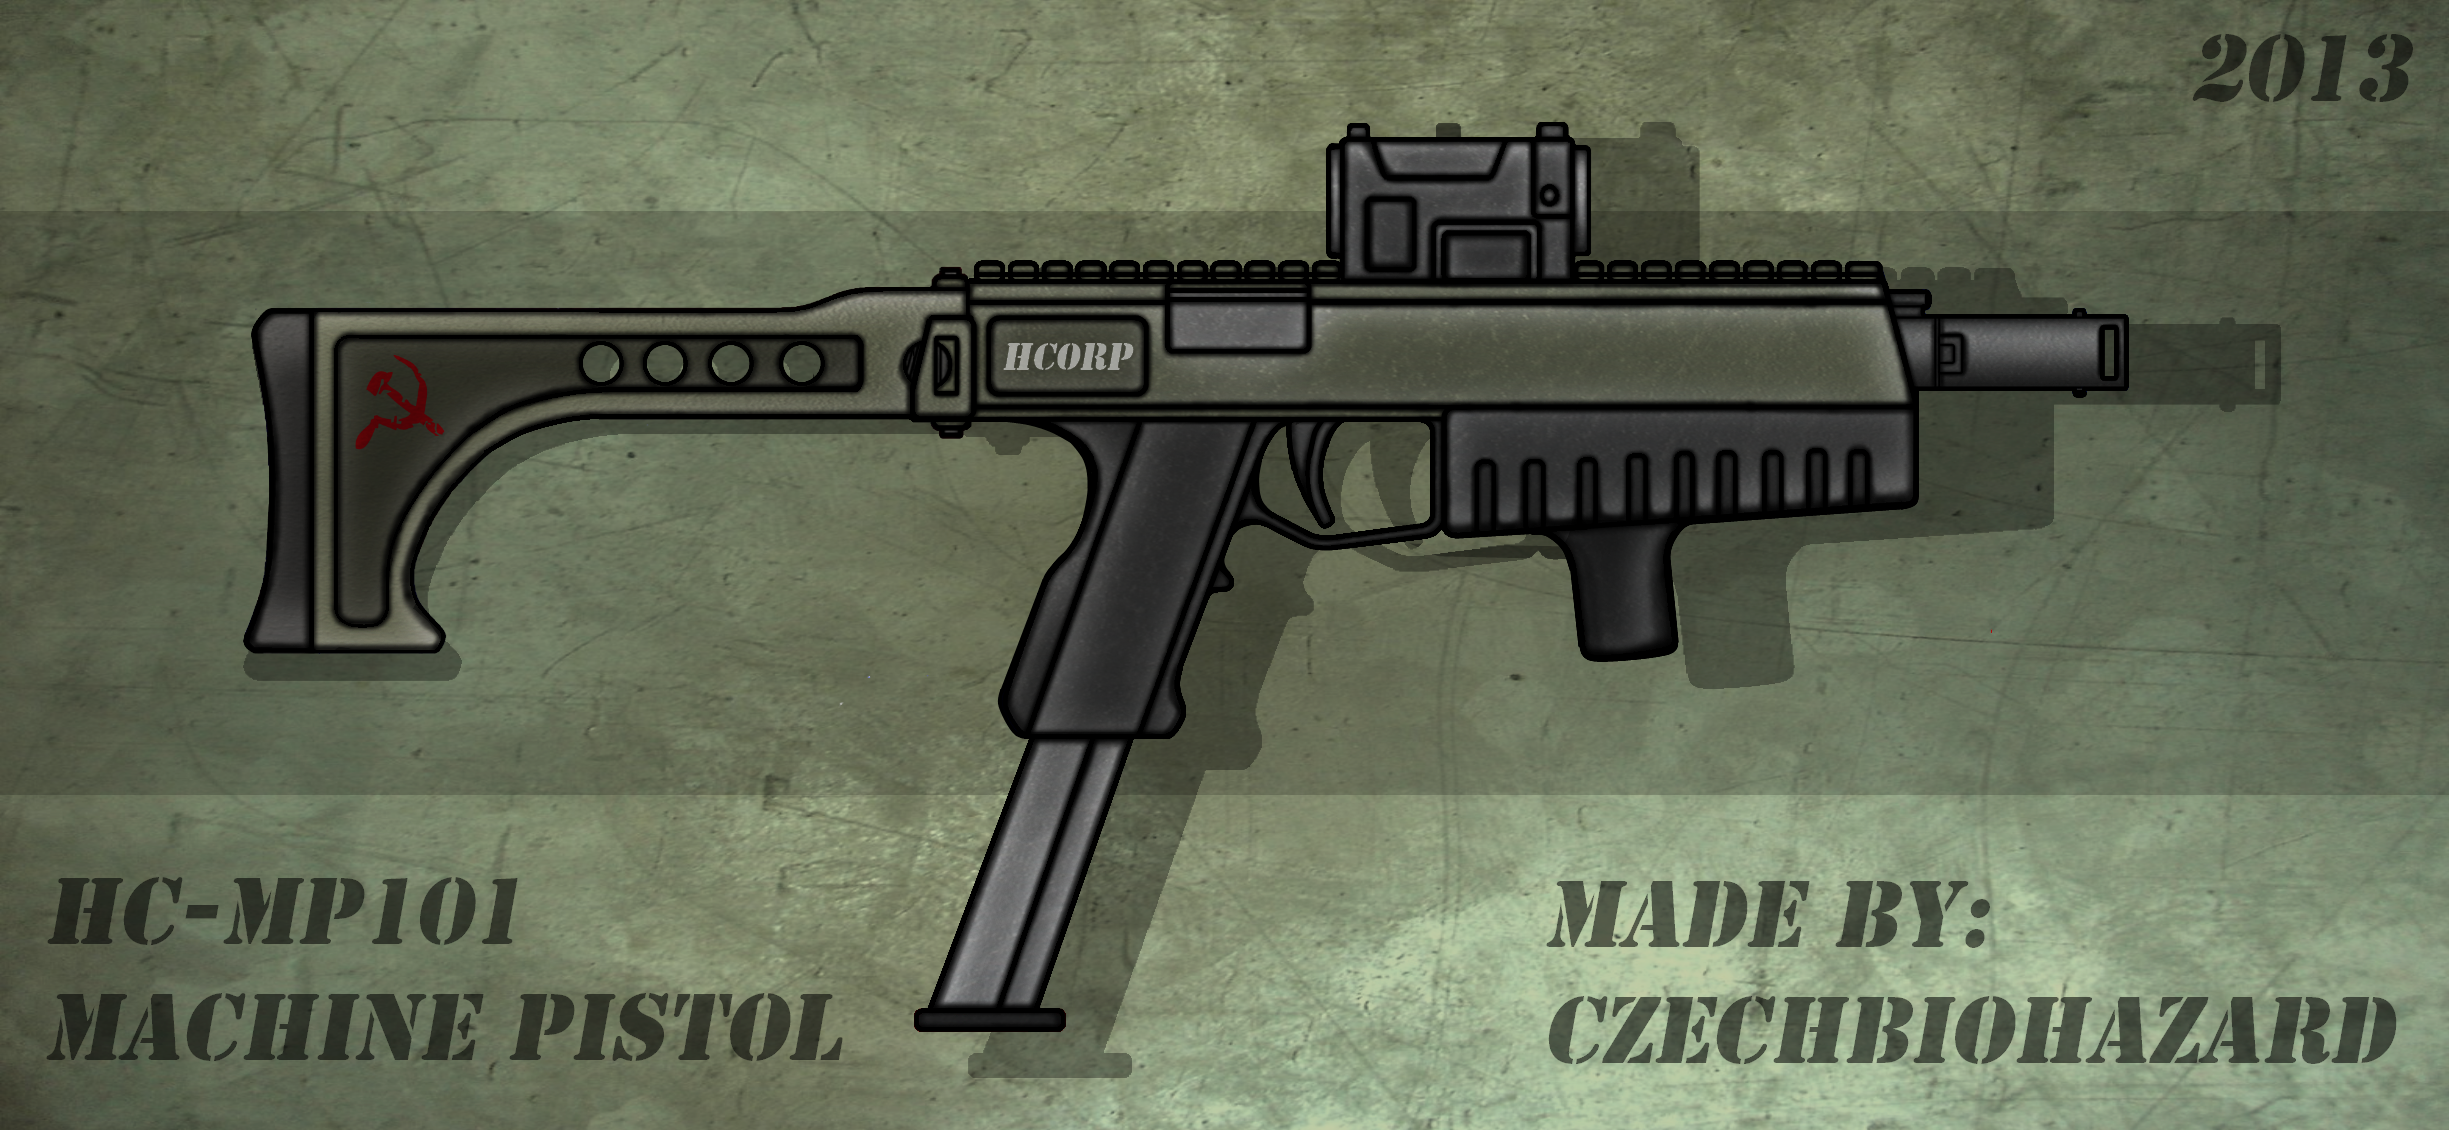 Fictional Firearm: HC-MP101 Machine Pistol by CzechBiohazard